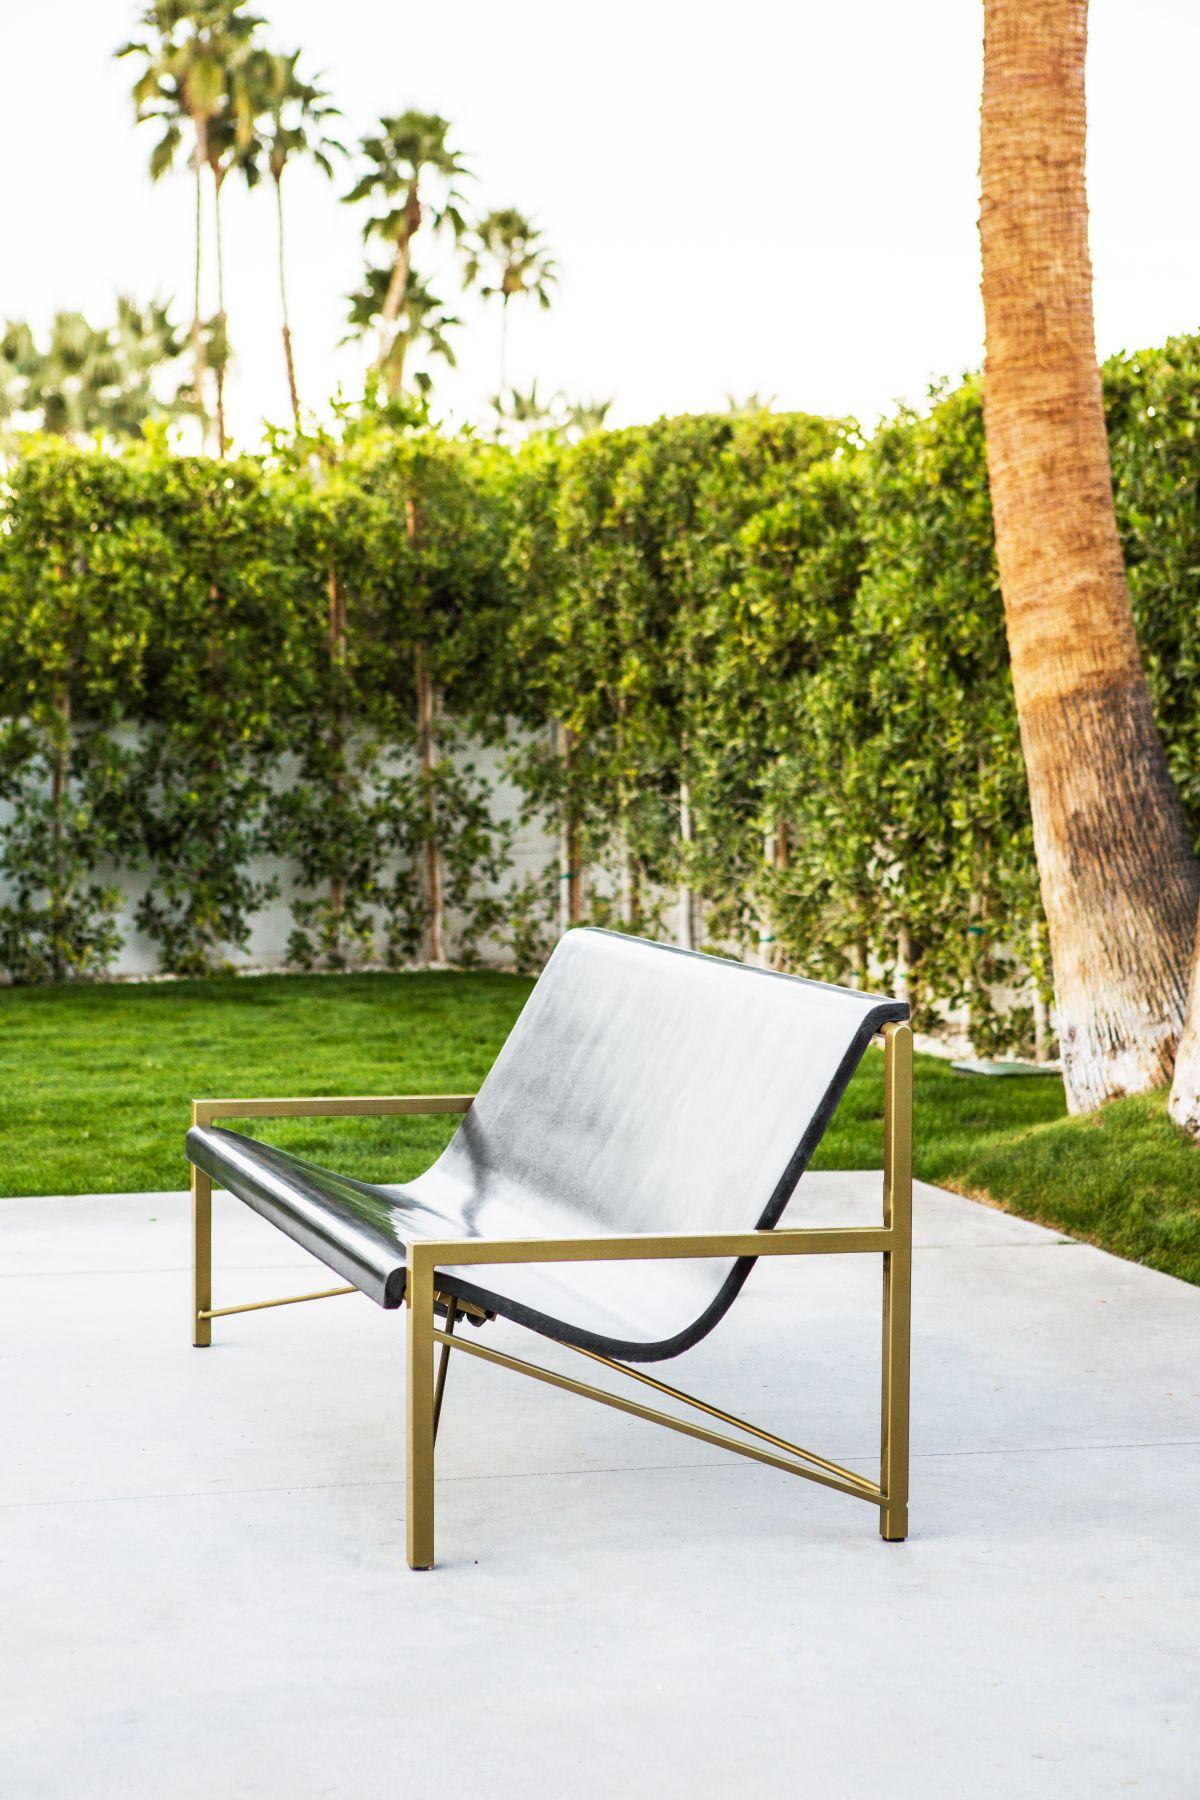 Galanter U0026 Jones Heat Up The Outdoor Furniture Market